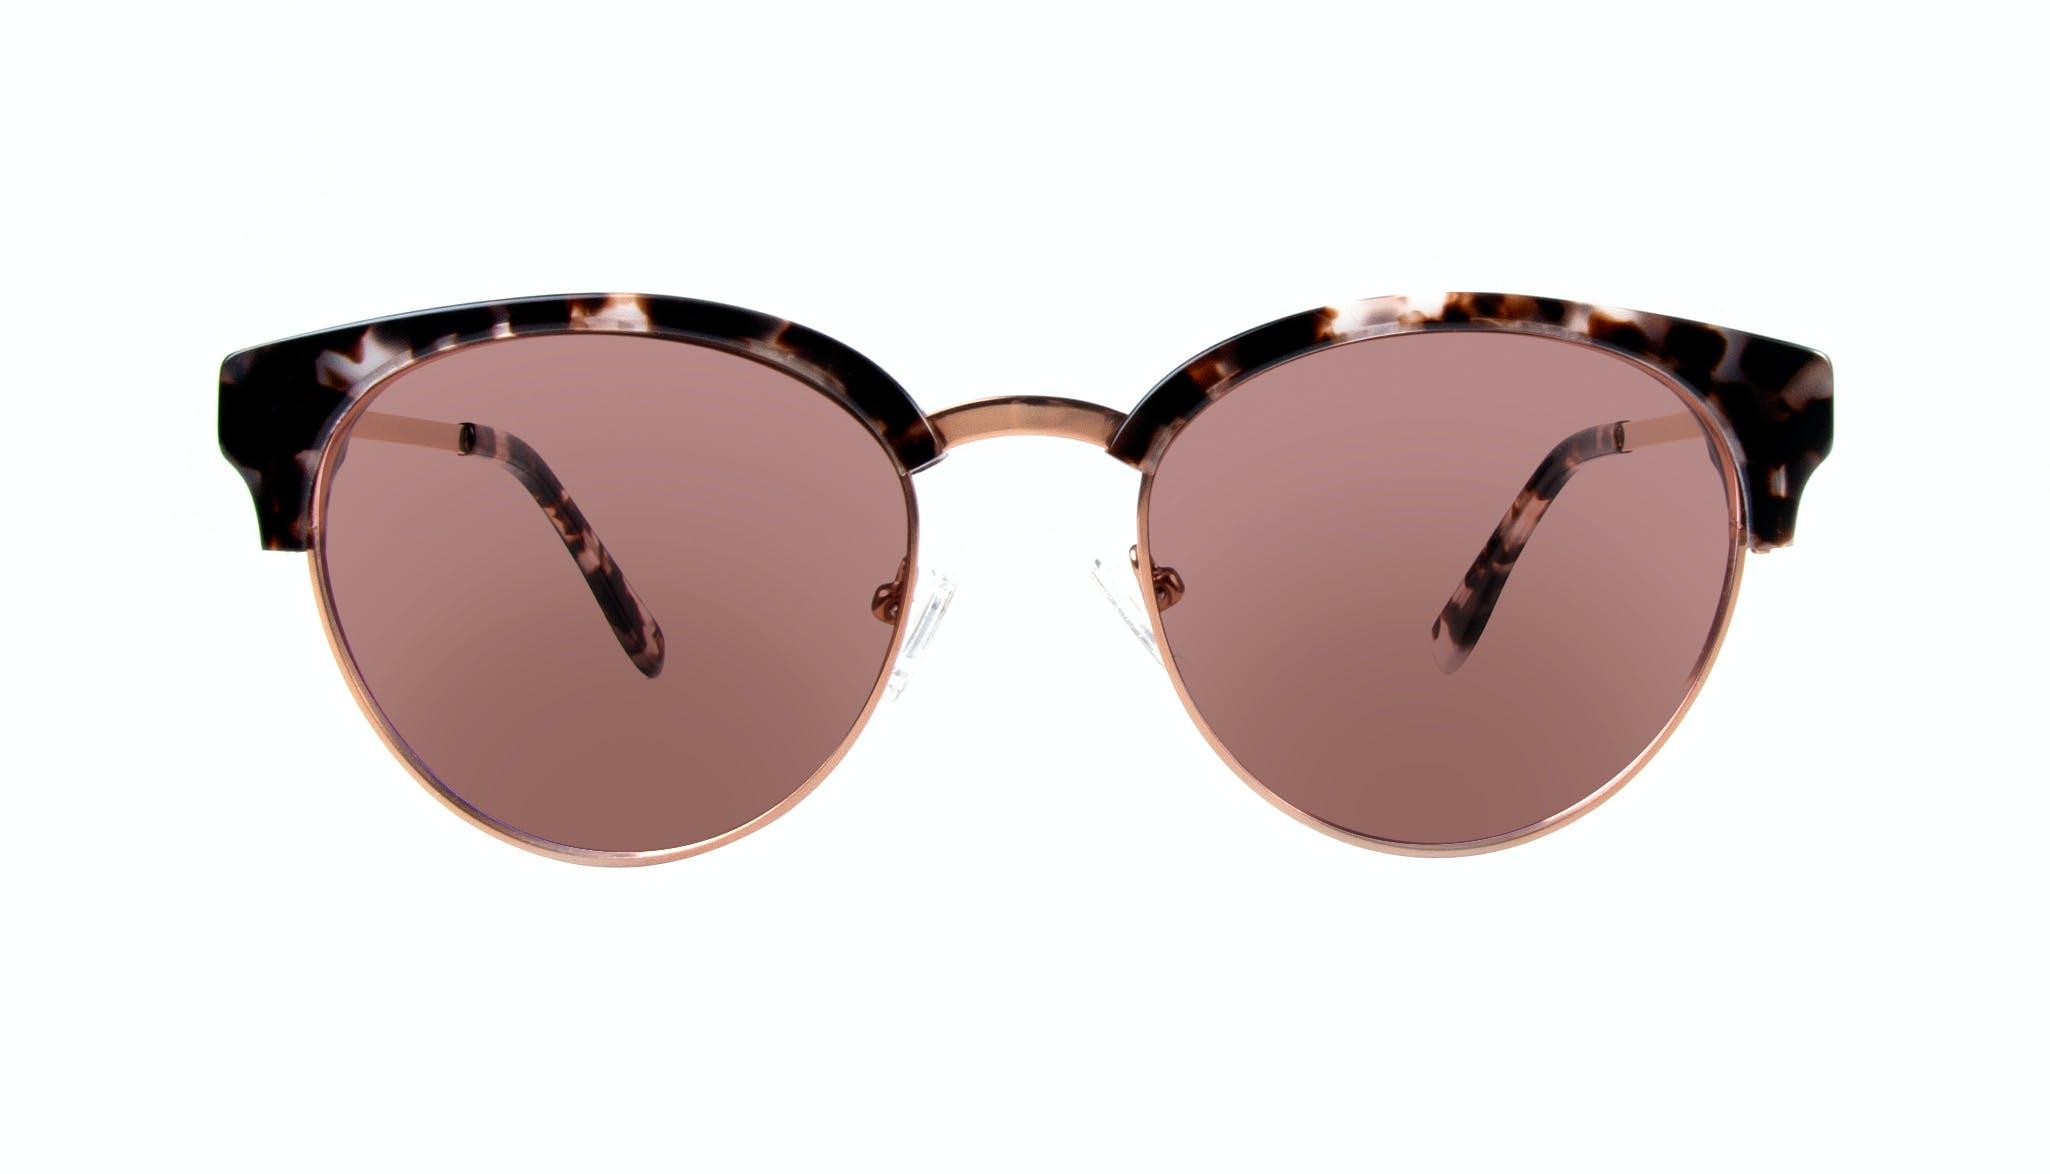 Affordable Fashion Glasses Round Sunglasses Women Allure Mocha Tortoise Front